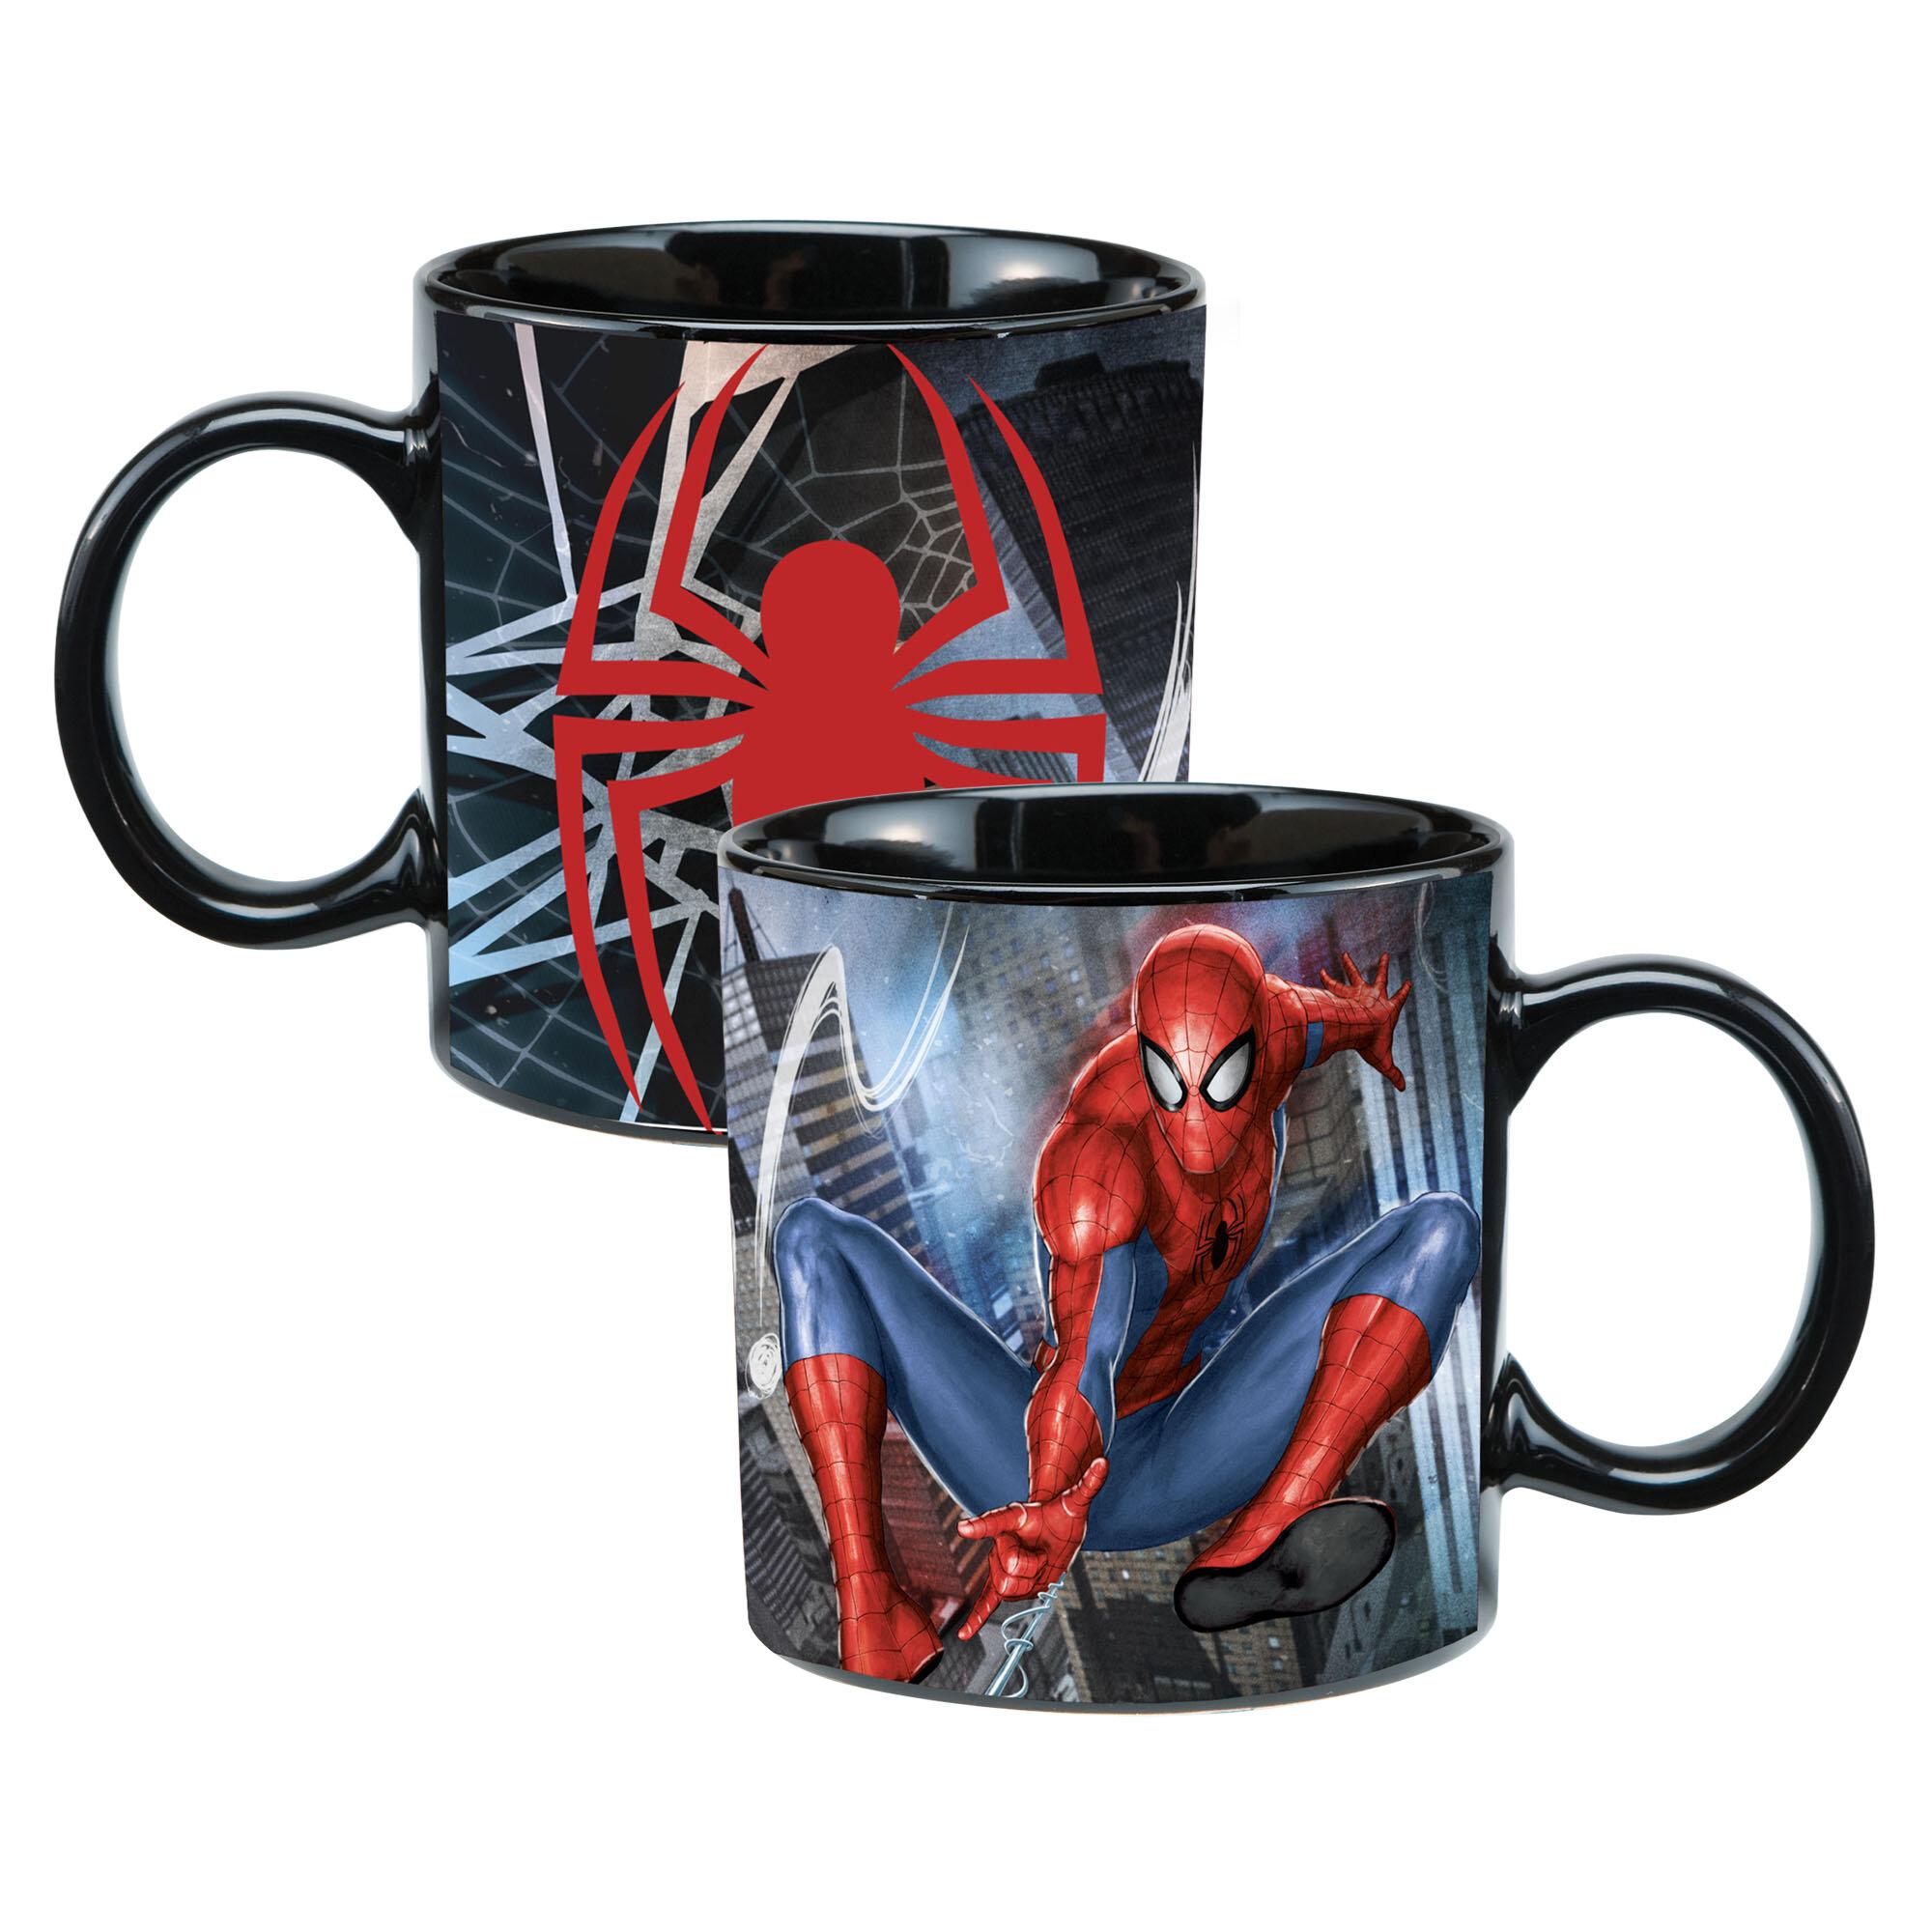 Marvel Spiderman Funko Coffee Mug Cup NEW